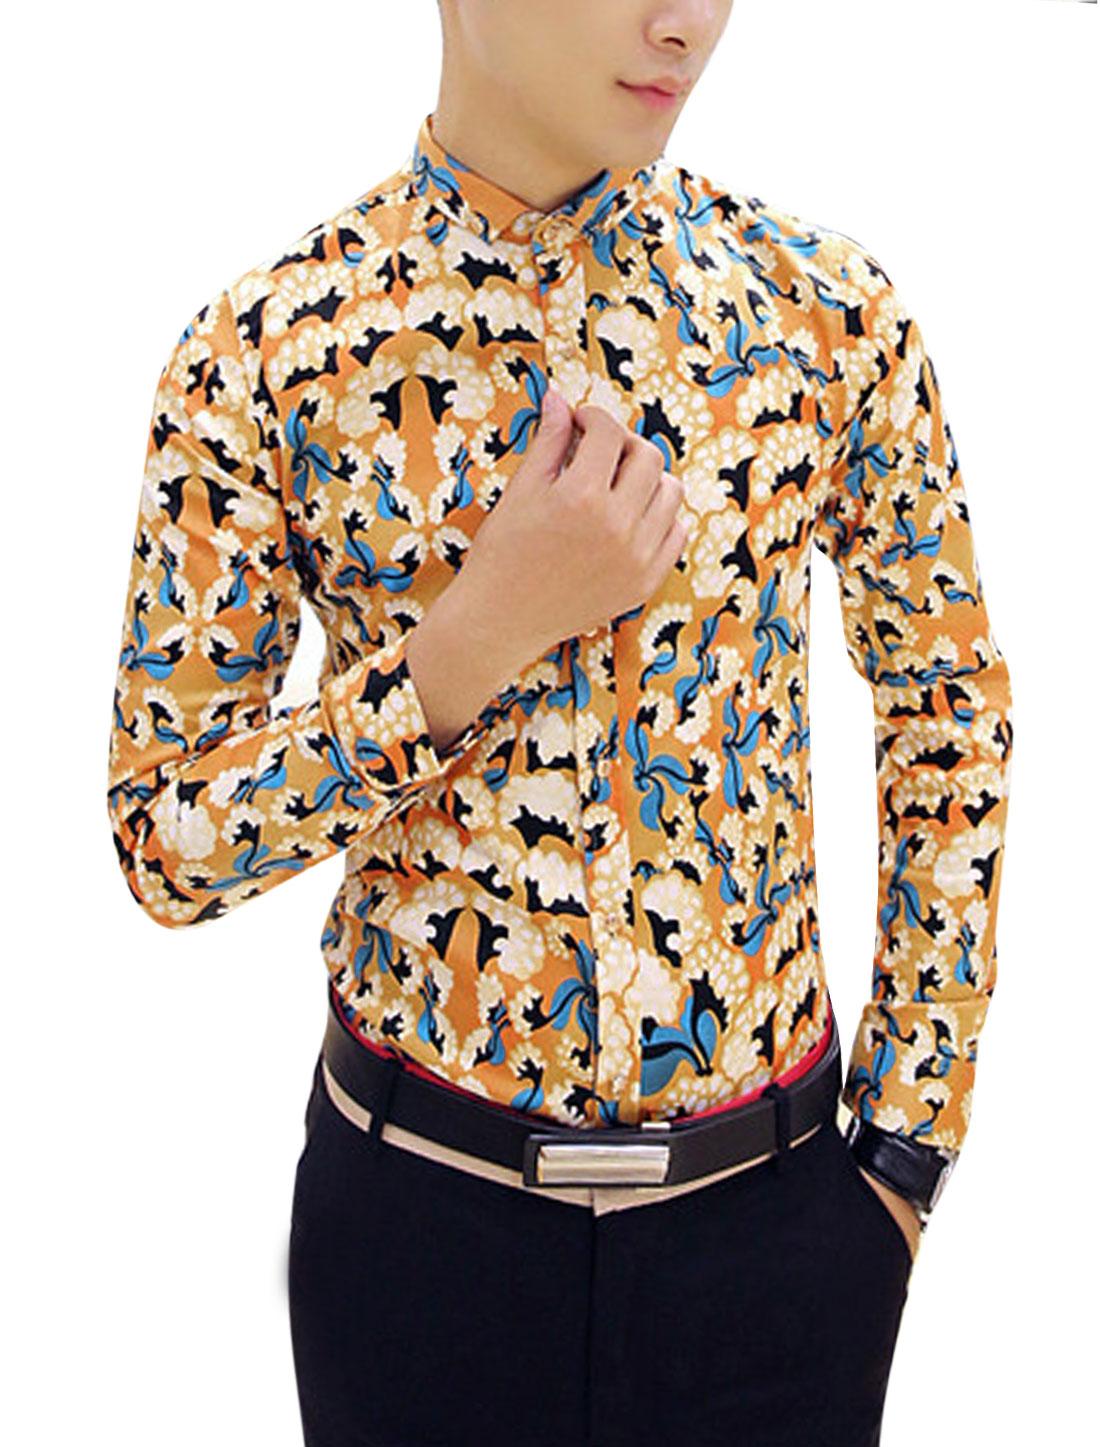 Man Ochre Point Collar Long Sleevs Single Breasted Designed Button Shirt S